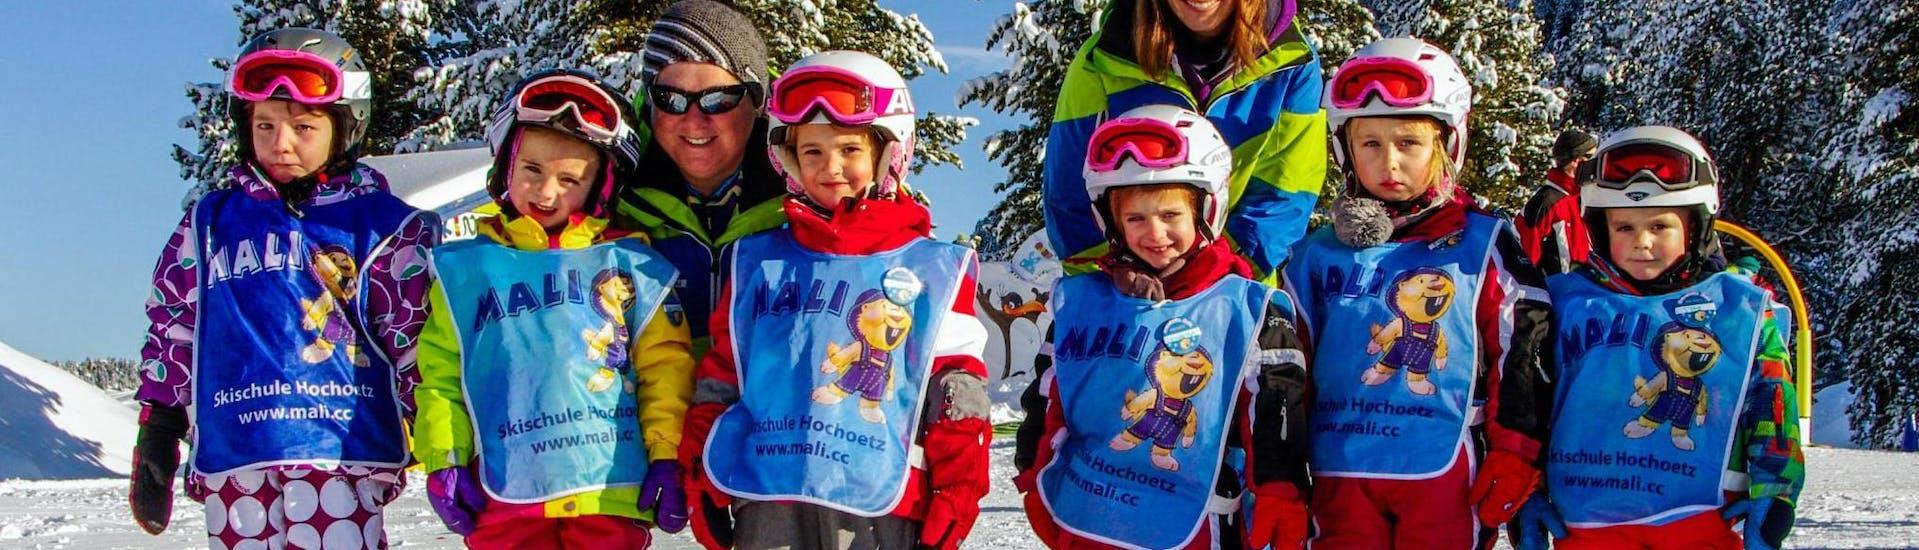 Private Ski Lessons for Kids of All Levels avec Skischool MALI / MALISPORT Oetz - Hero image